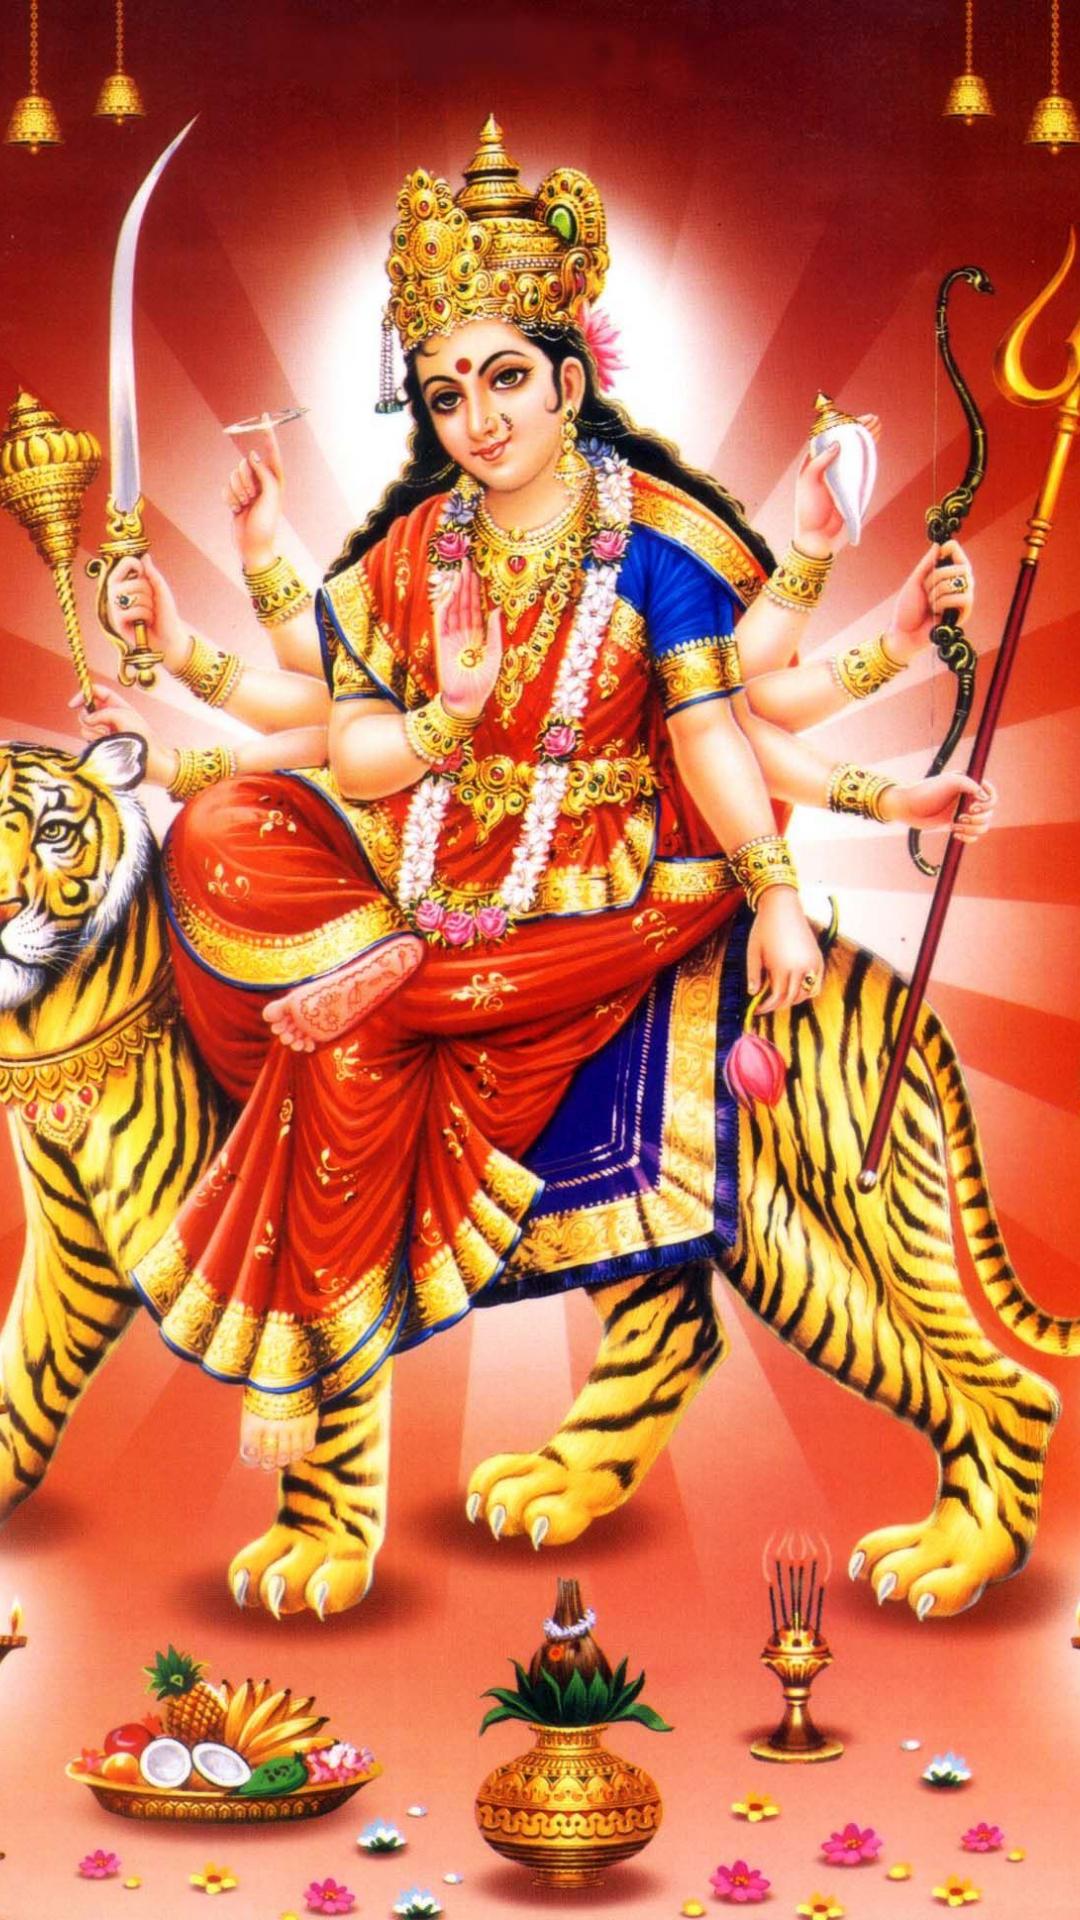 Free Download Download Highres Durga Devi Images Radha Krishna Wallpaper 1431x1938 For Your Desktop Mobile Tablet Explore 40 Durga Wallpaper Durga Wallpaper God Durga Hd Wallpaper Hd Durga Maa Wallpapers